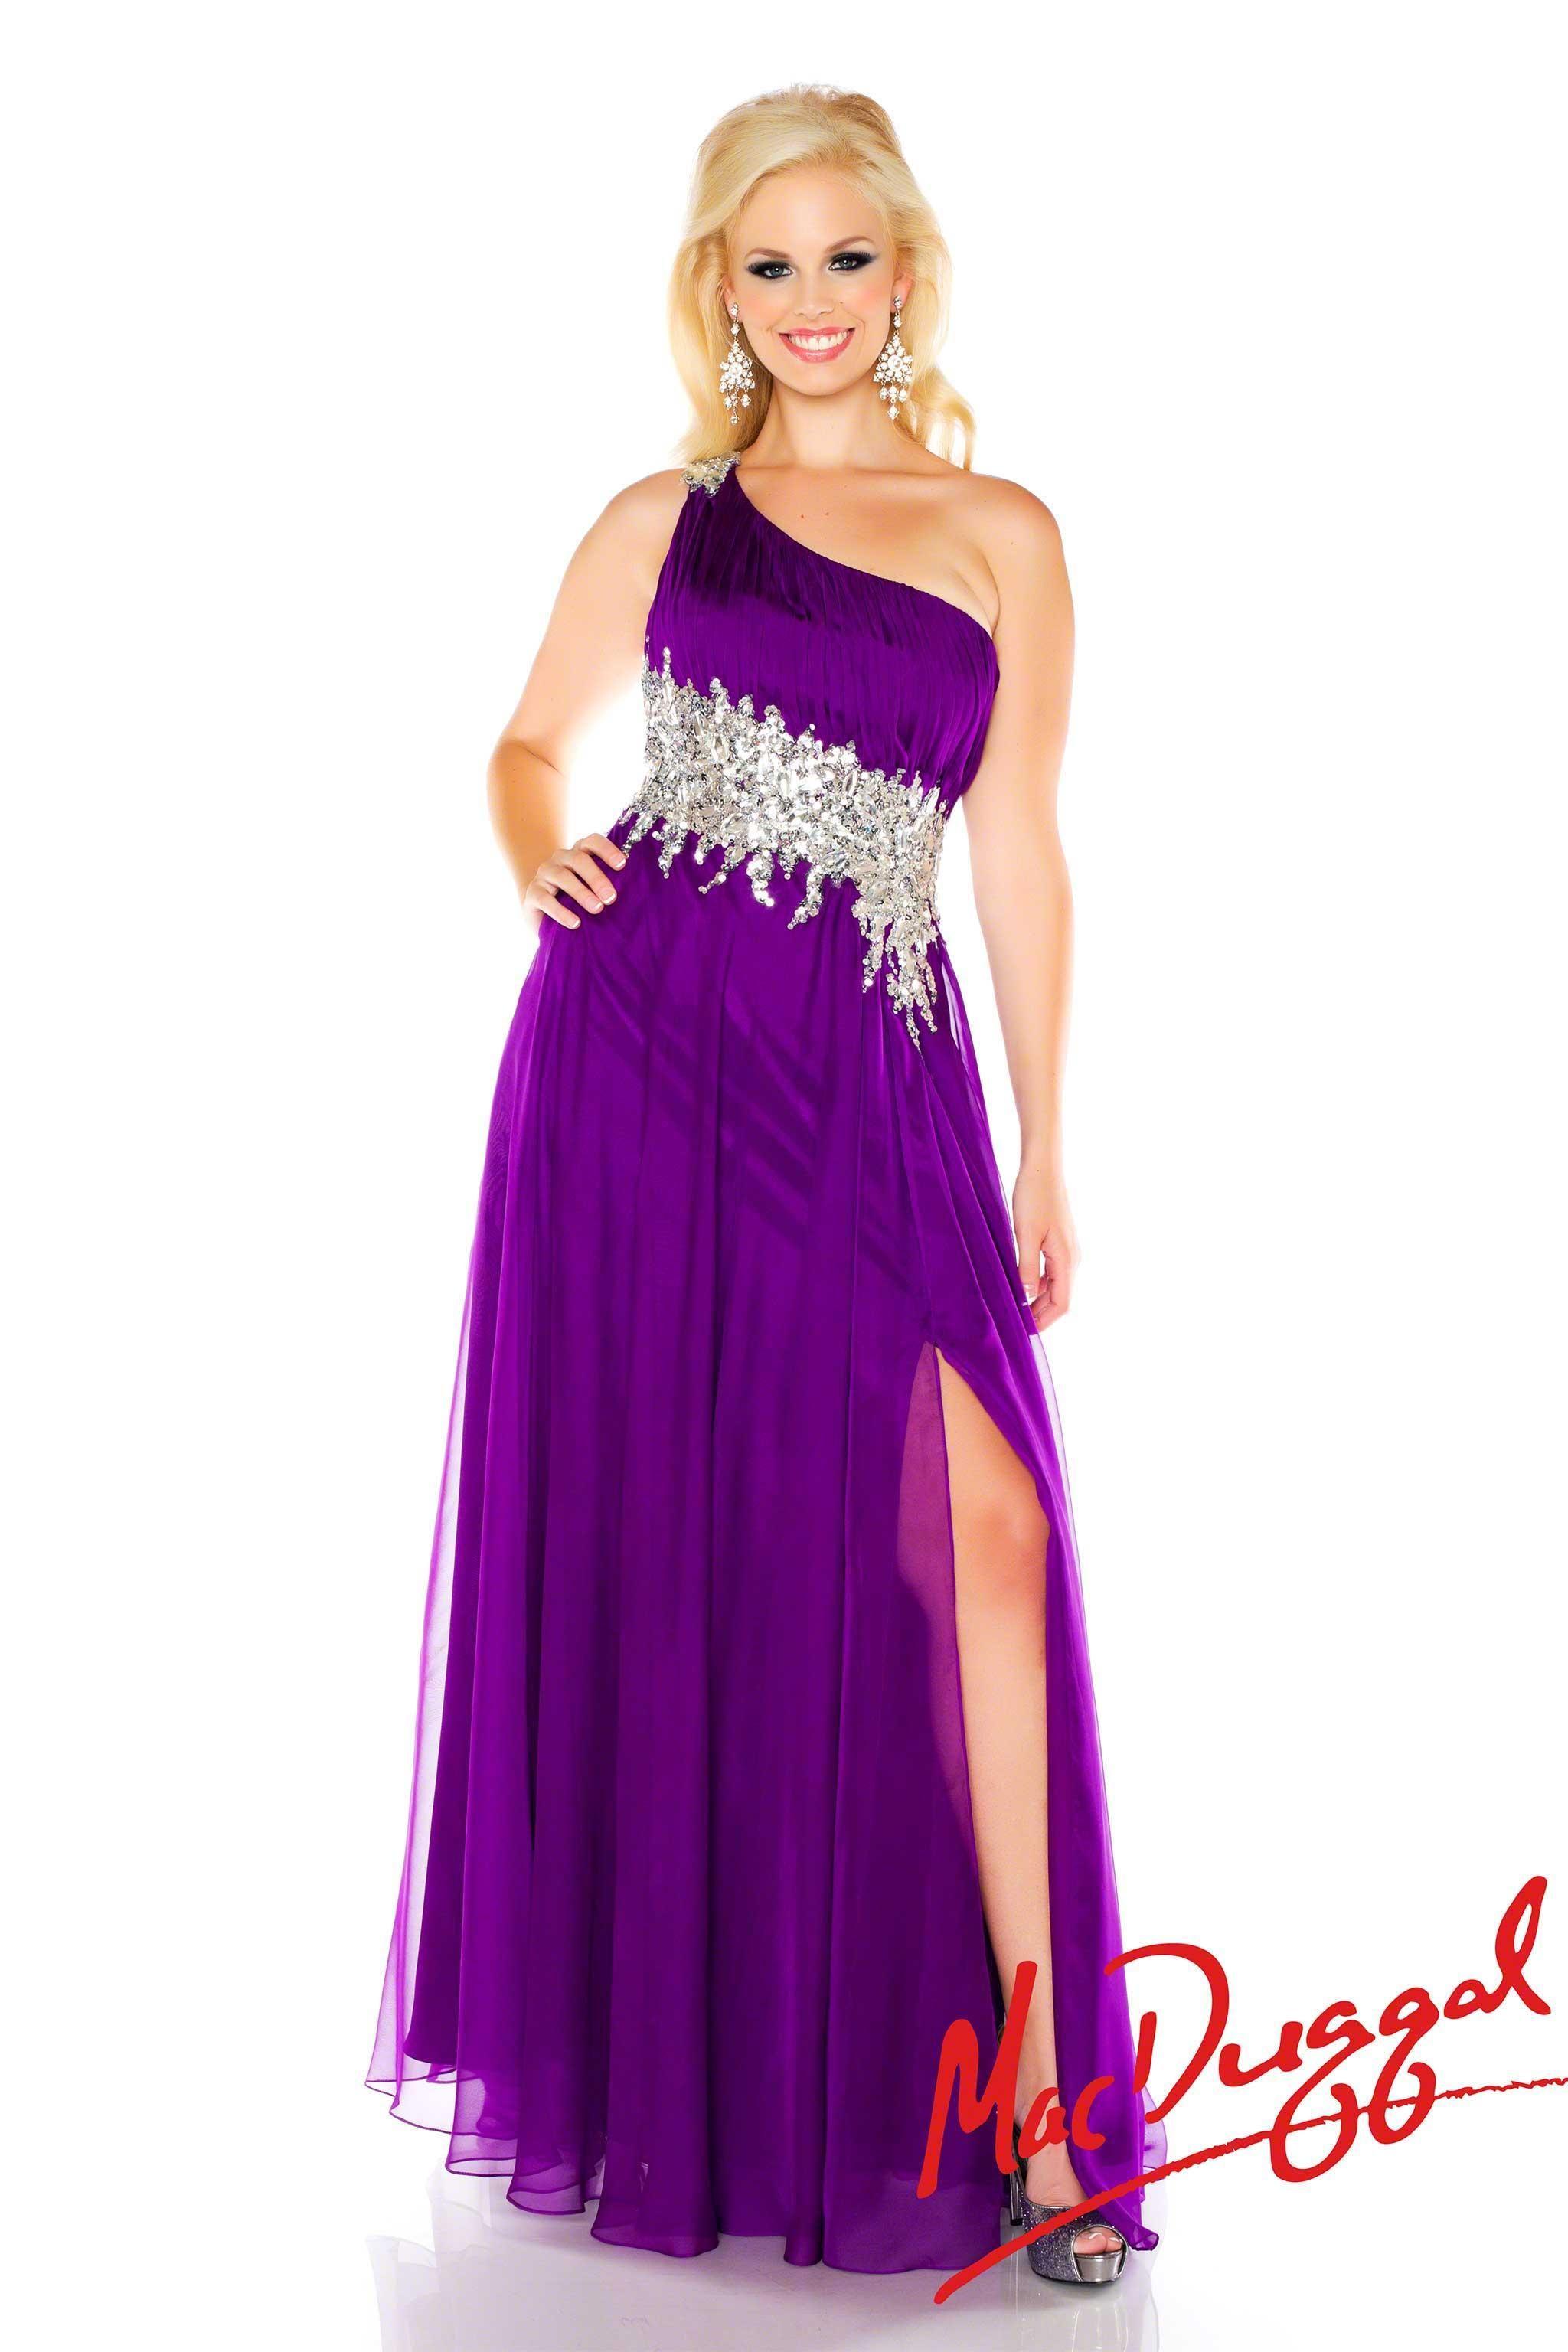 Neon Purple Prom Dress